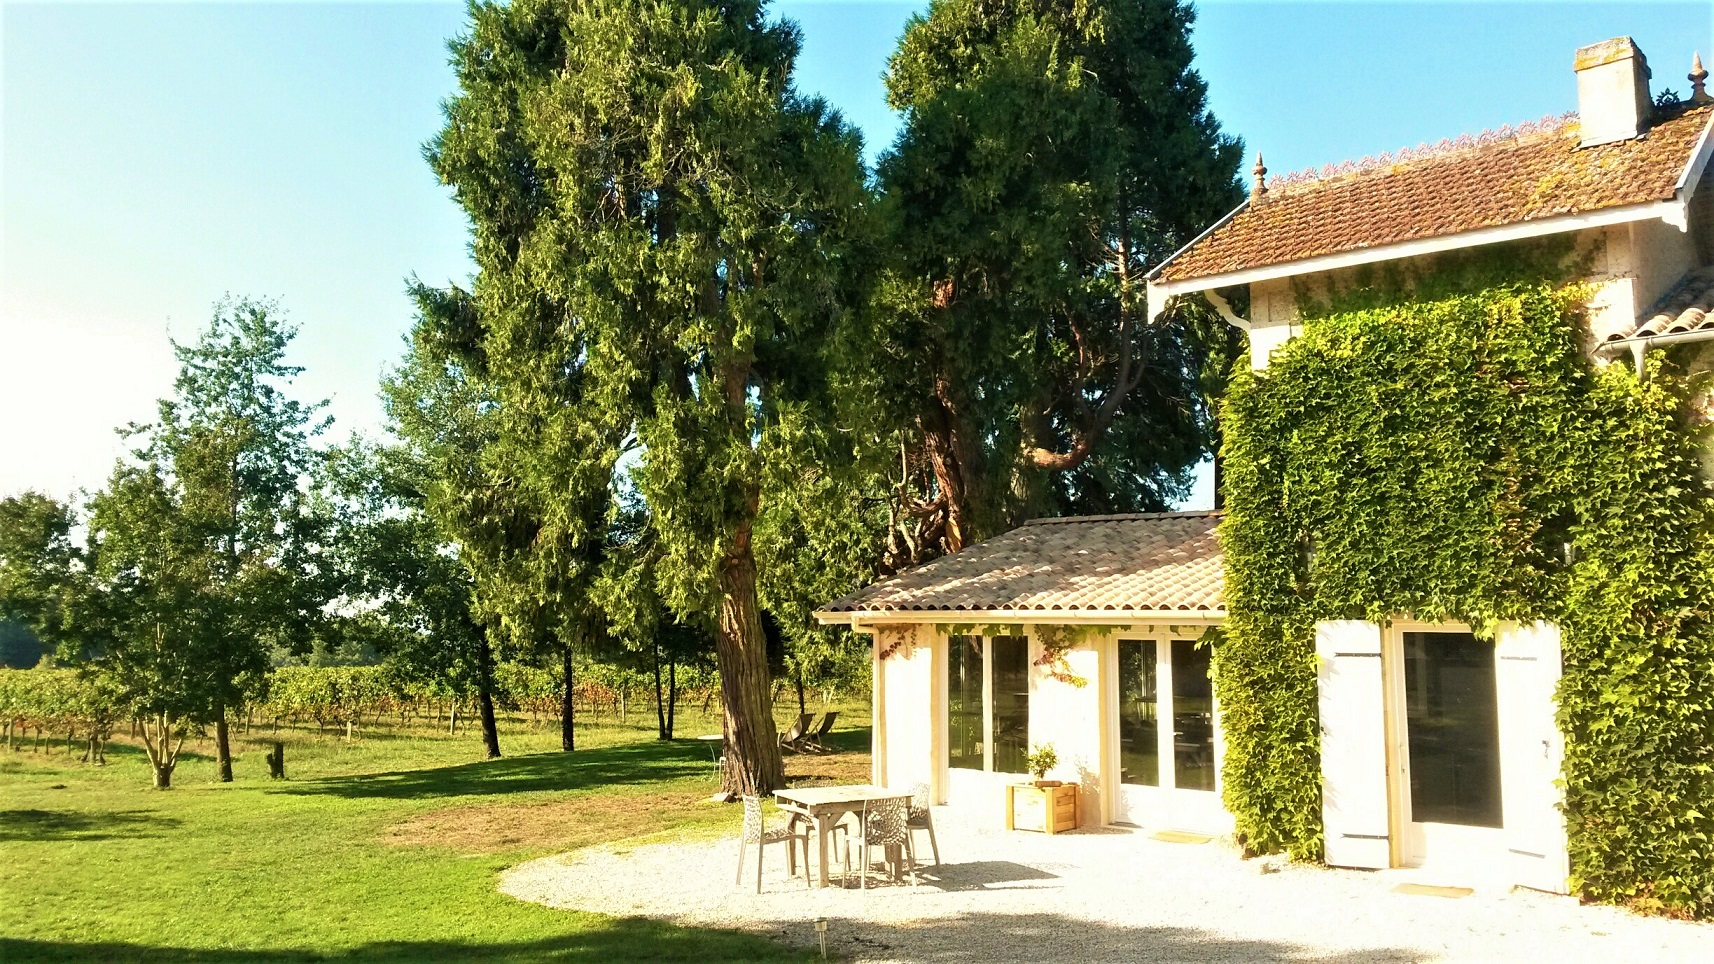 house to vines - Copy.jpg